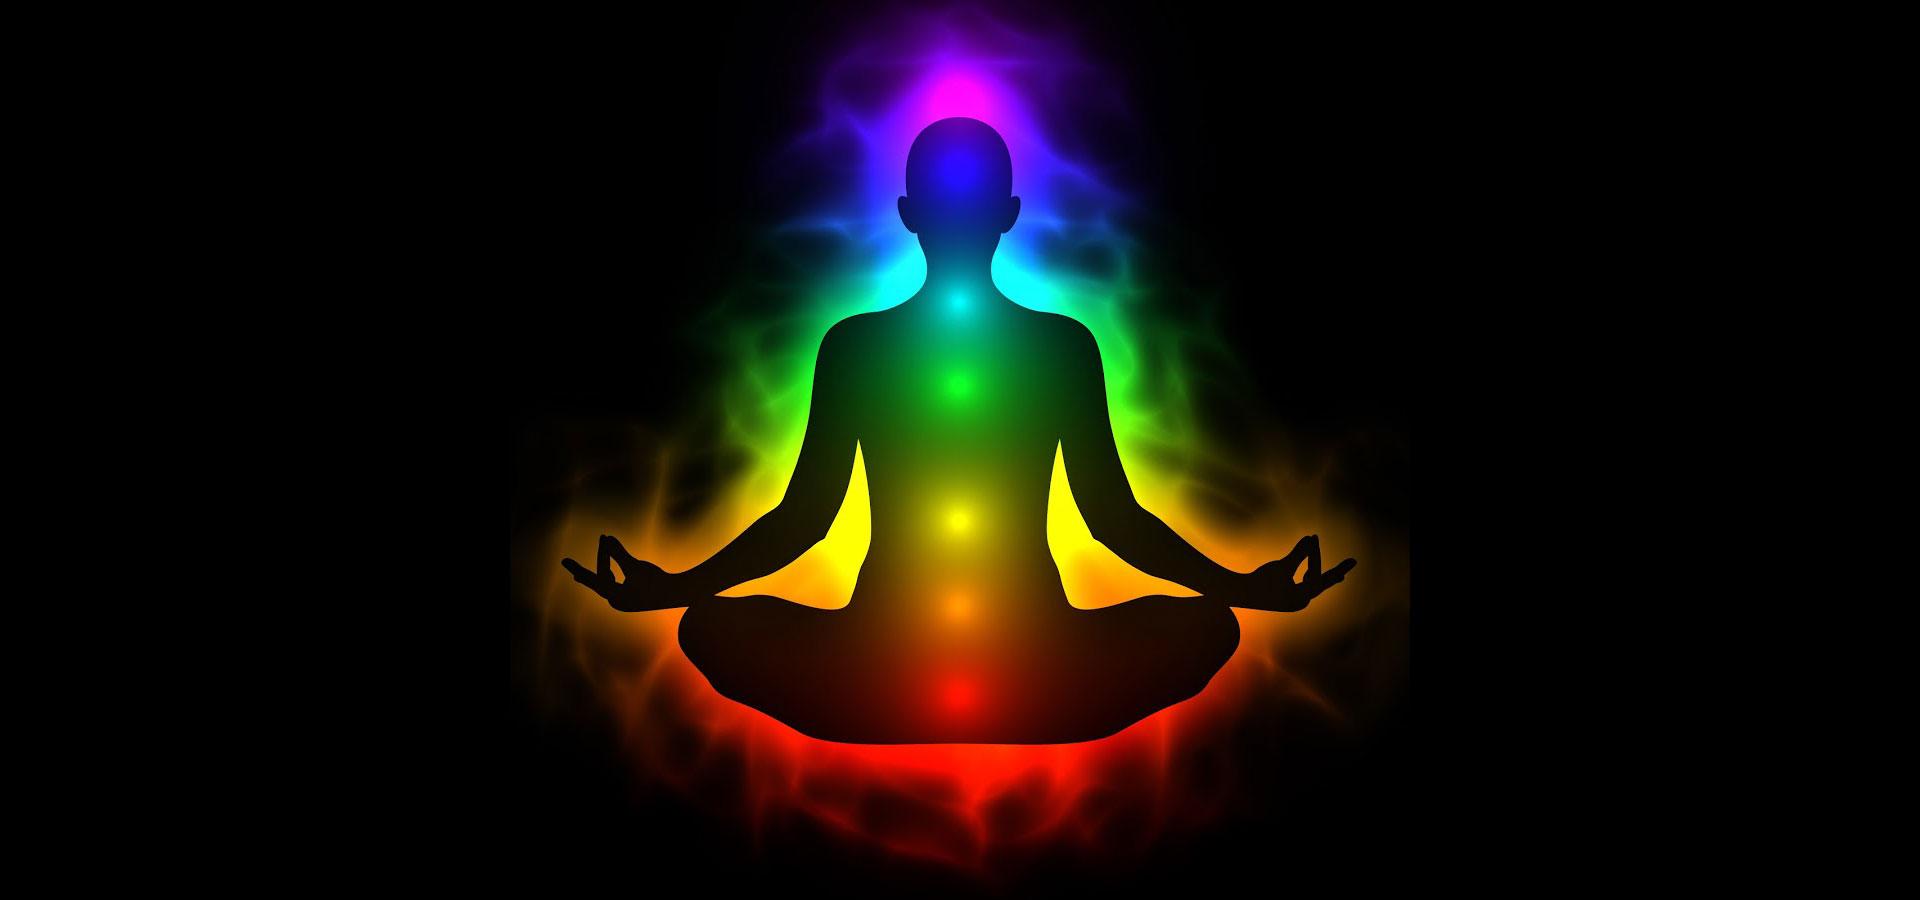 ЙОГА во ХРИСТЕ ✝️ или христианский взгляд на йогу 1.1 #ВЕГАН 💚 #ХРИСТОЛЮБ ✝️